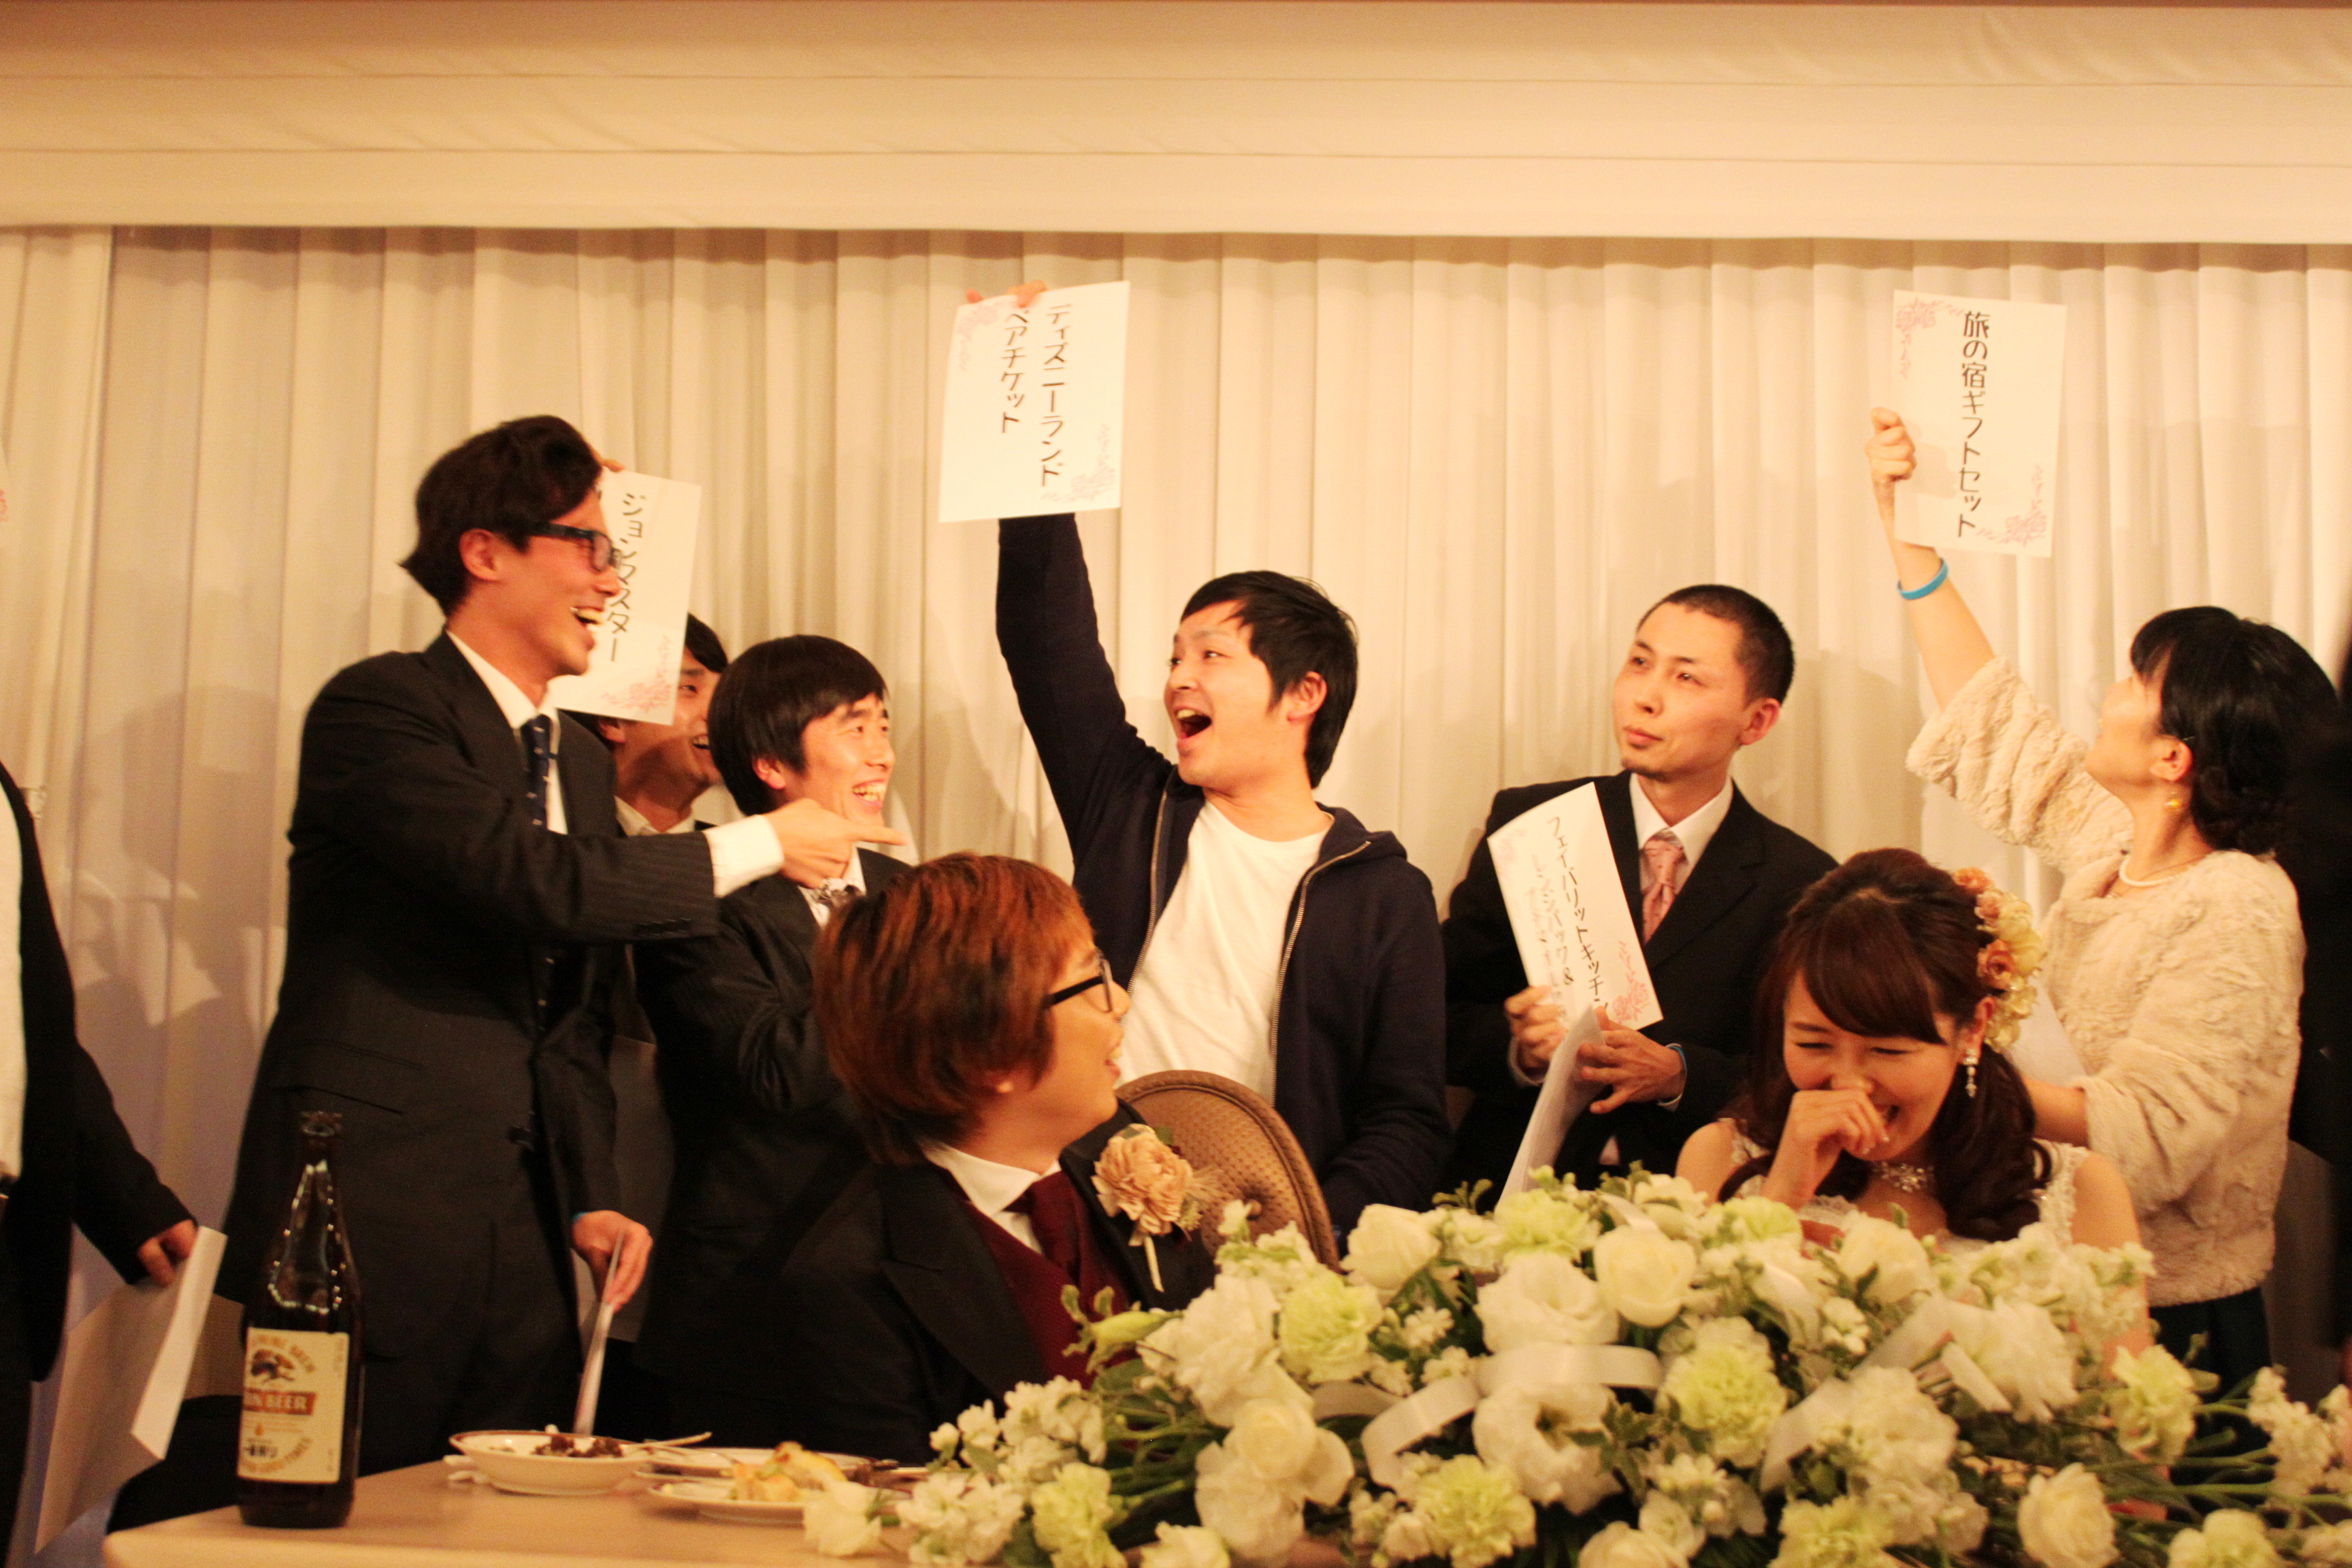 7dde5c29ed490 結婚式二次会かんたんビンゴゲーム盛り上げマニュアル!|2次会本舗